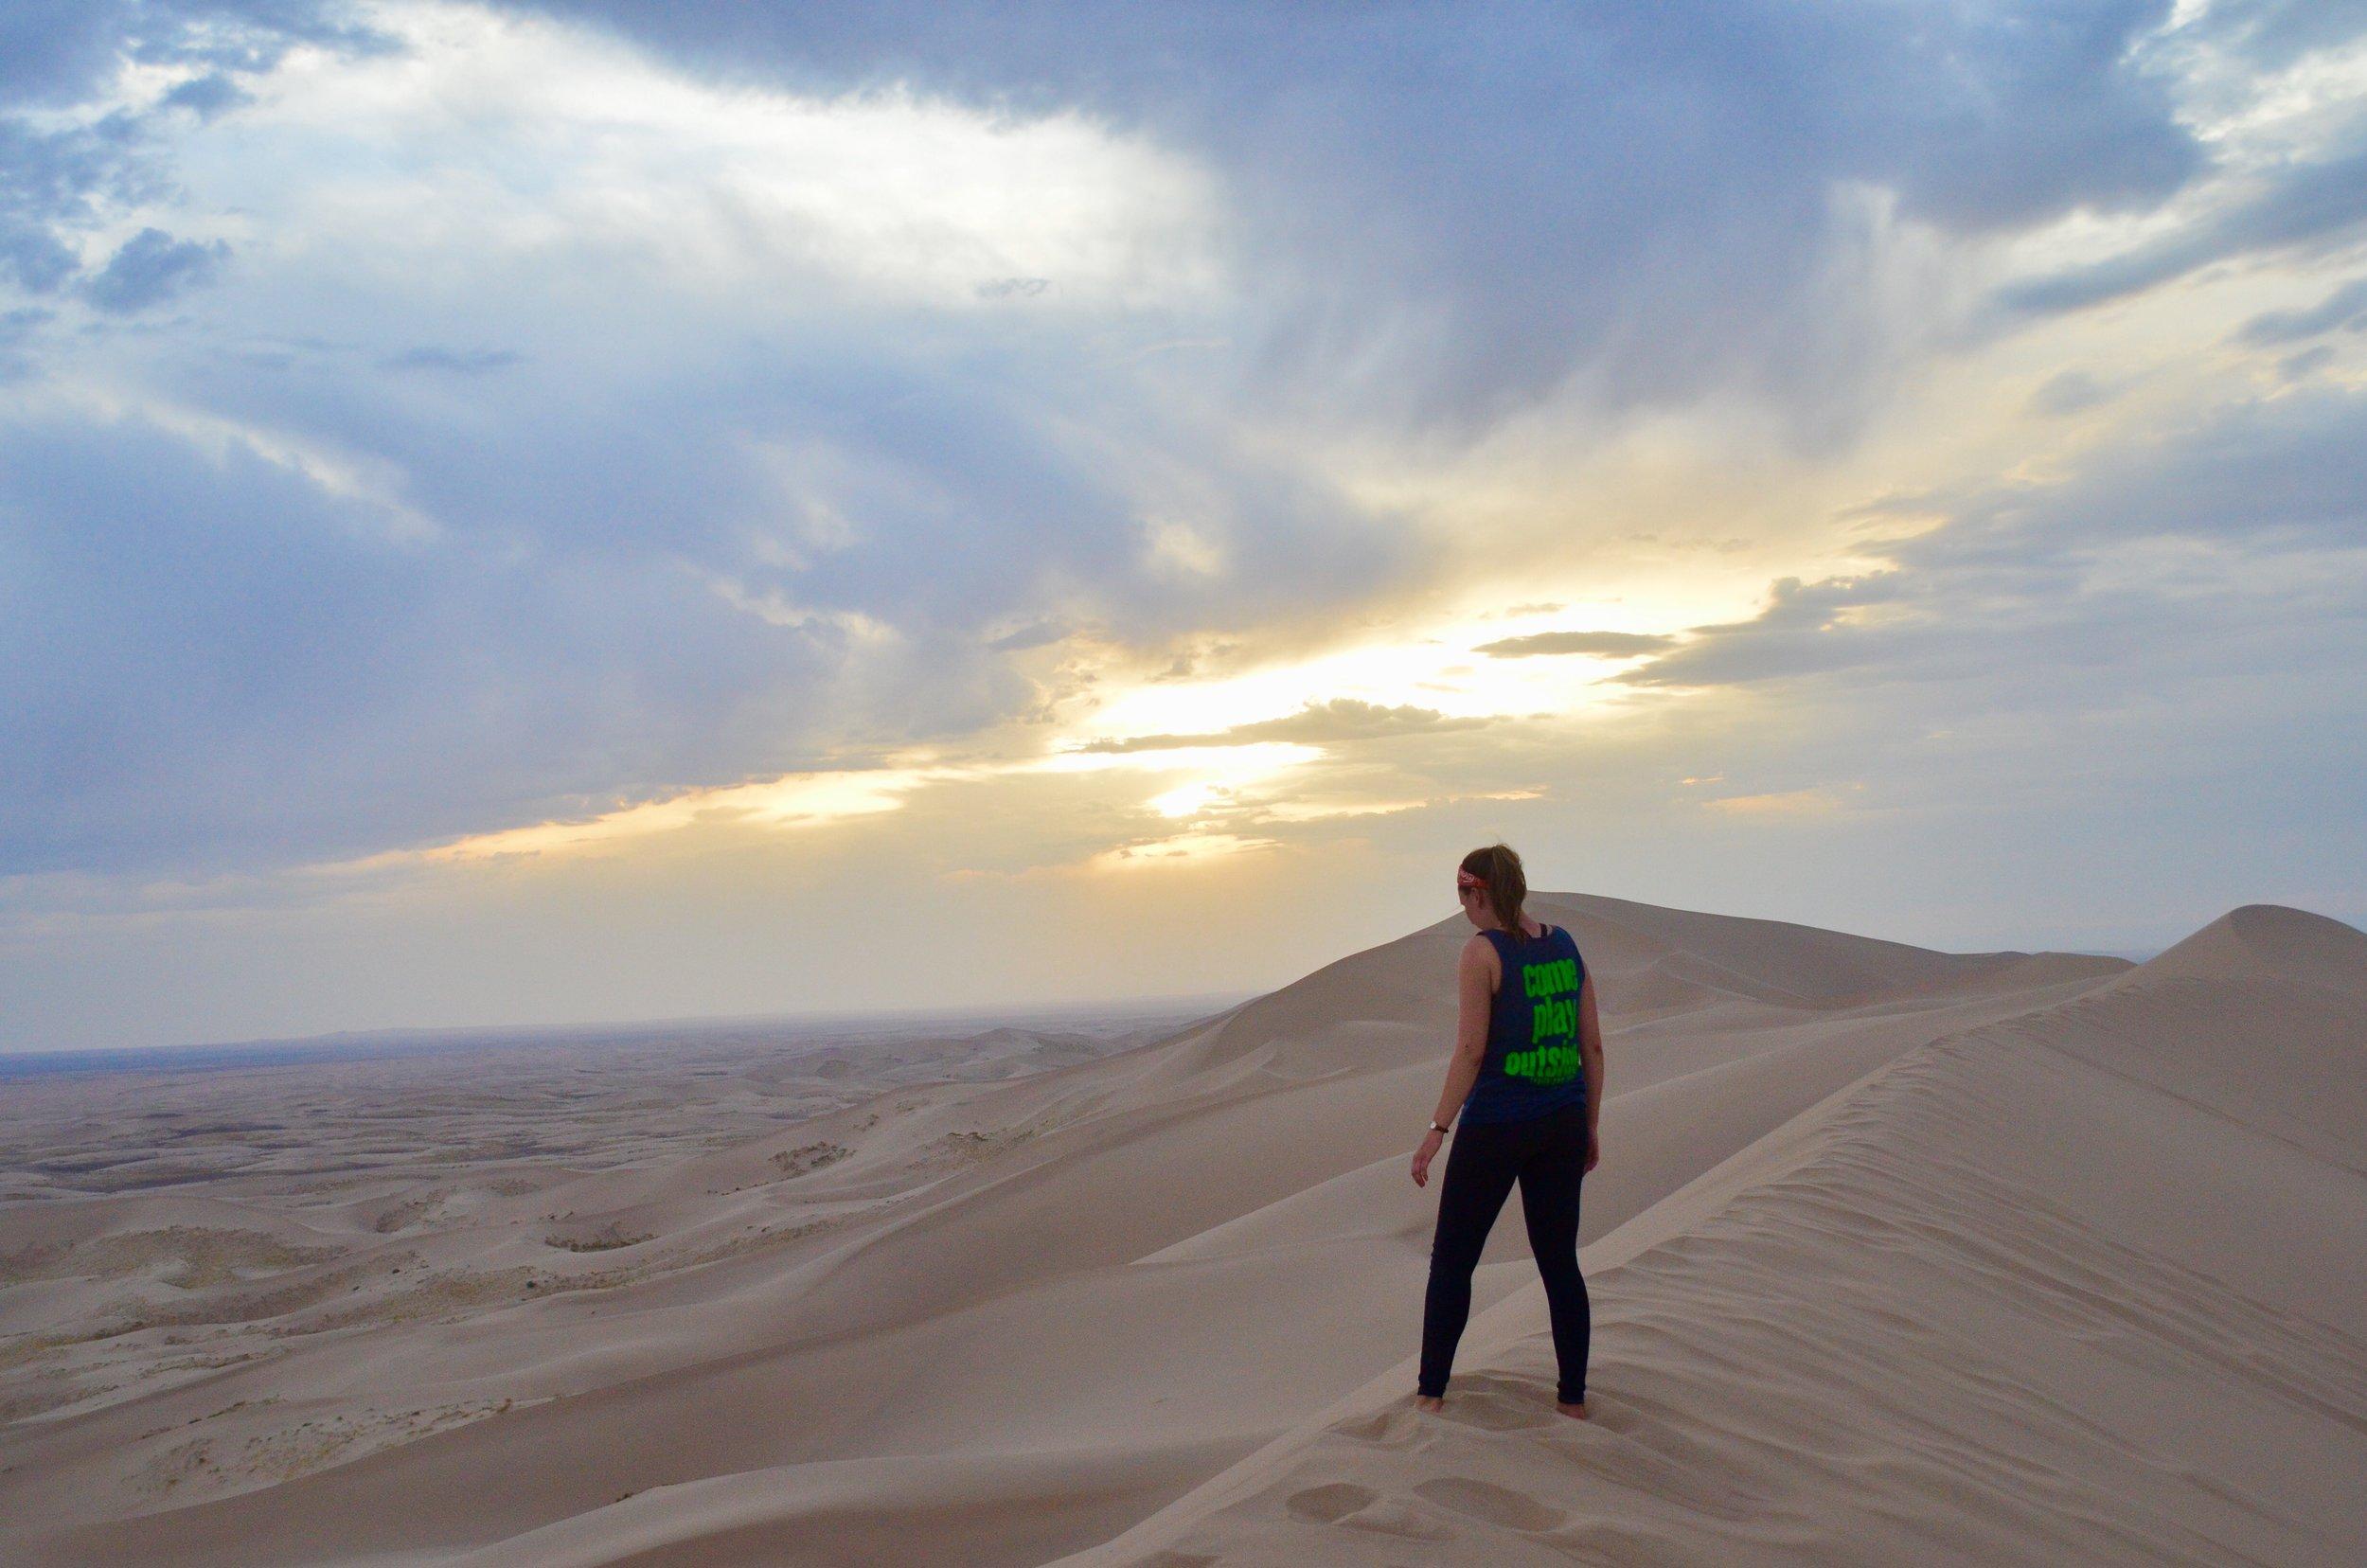 Hiking-the-Dunes-Gobi